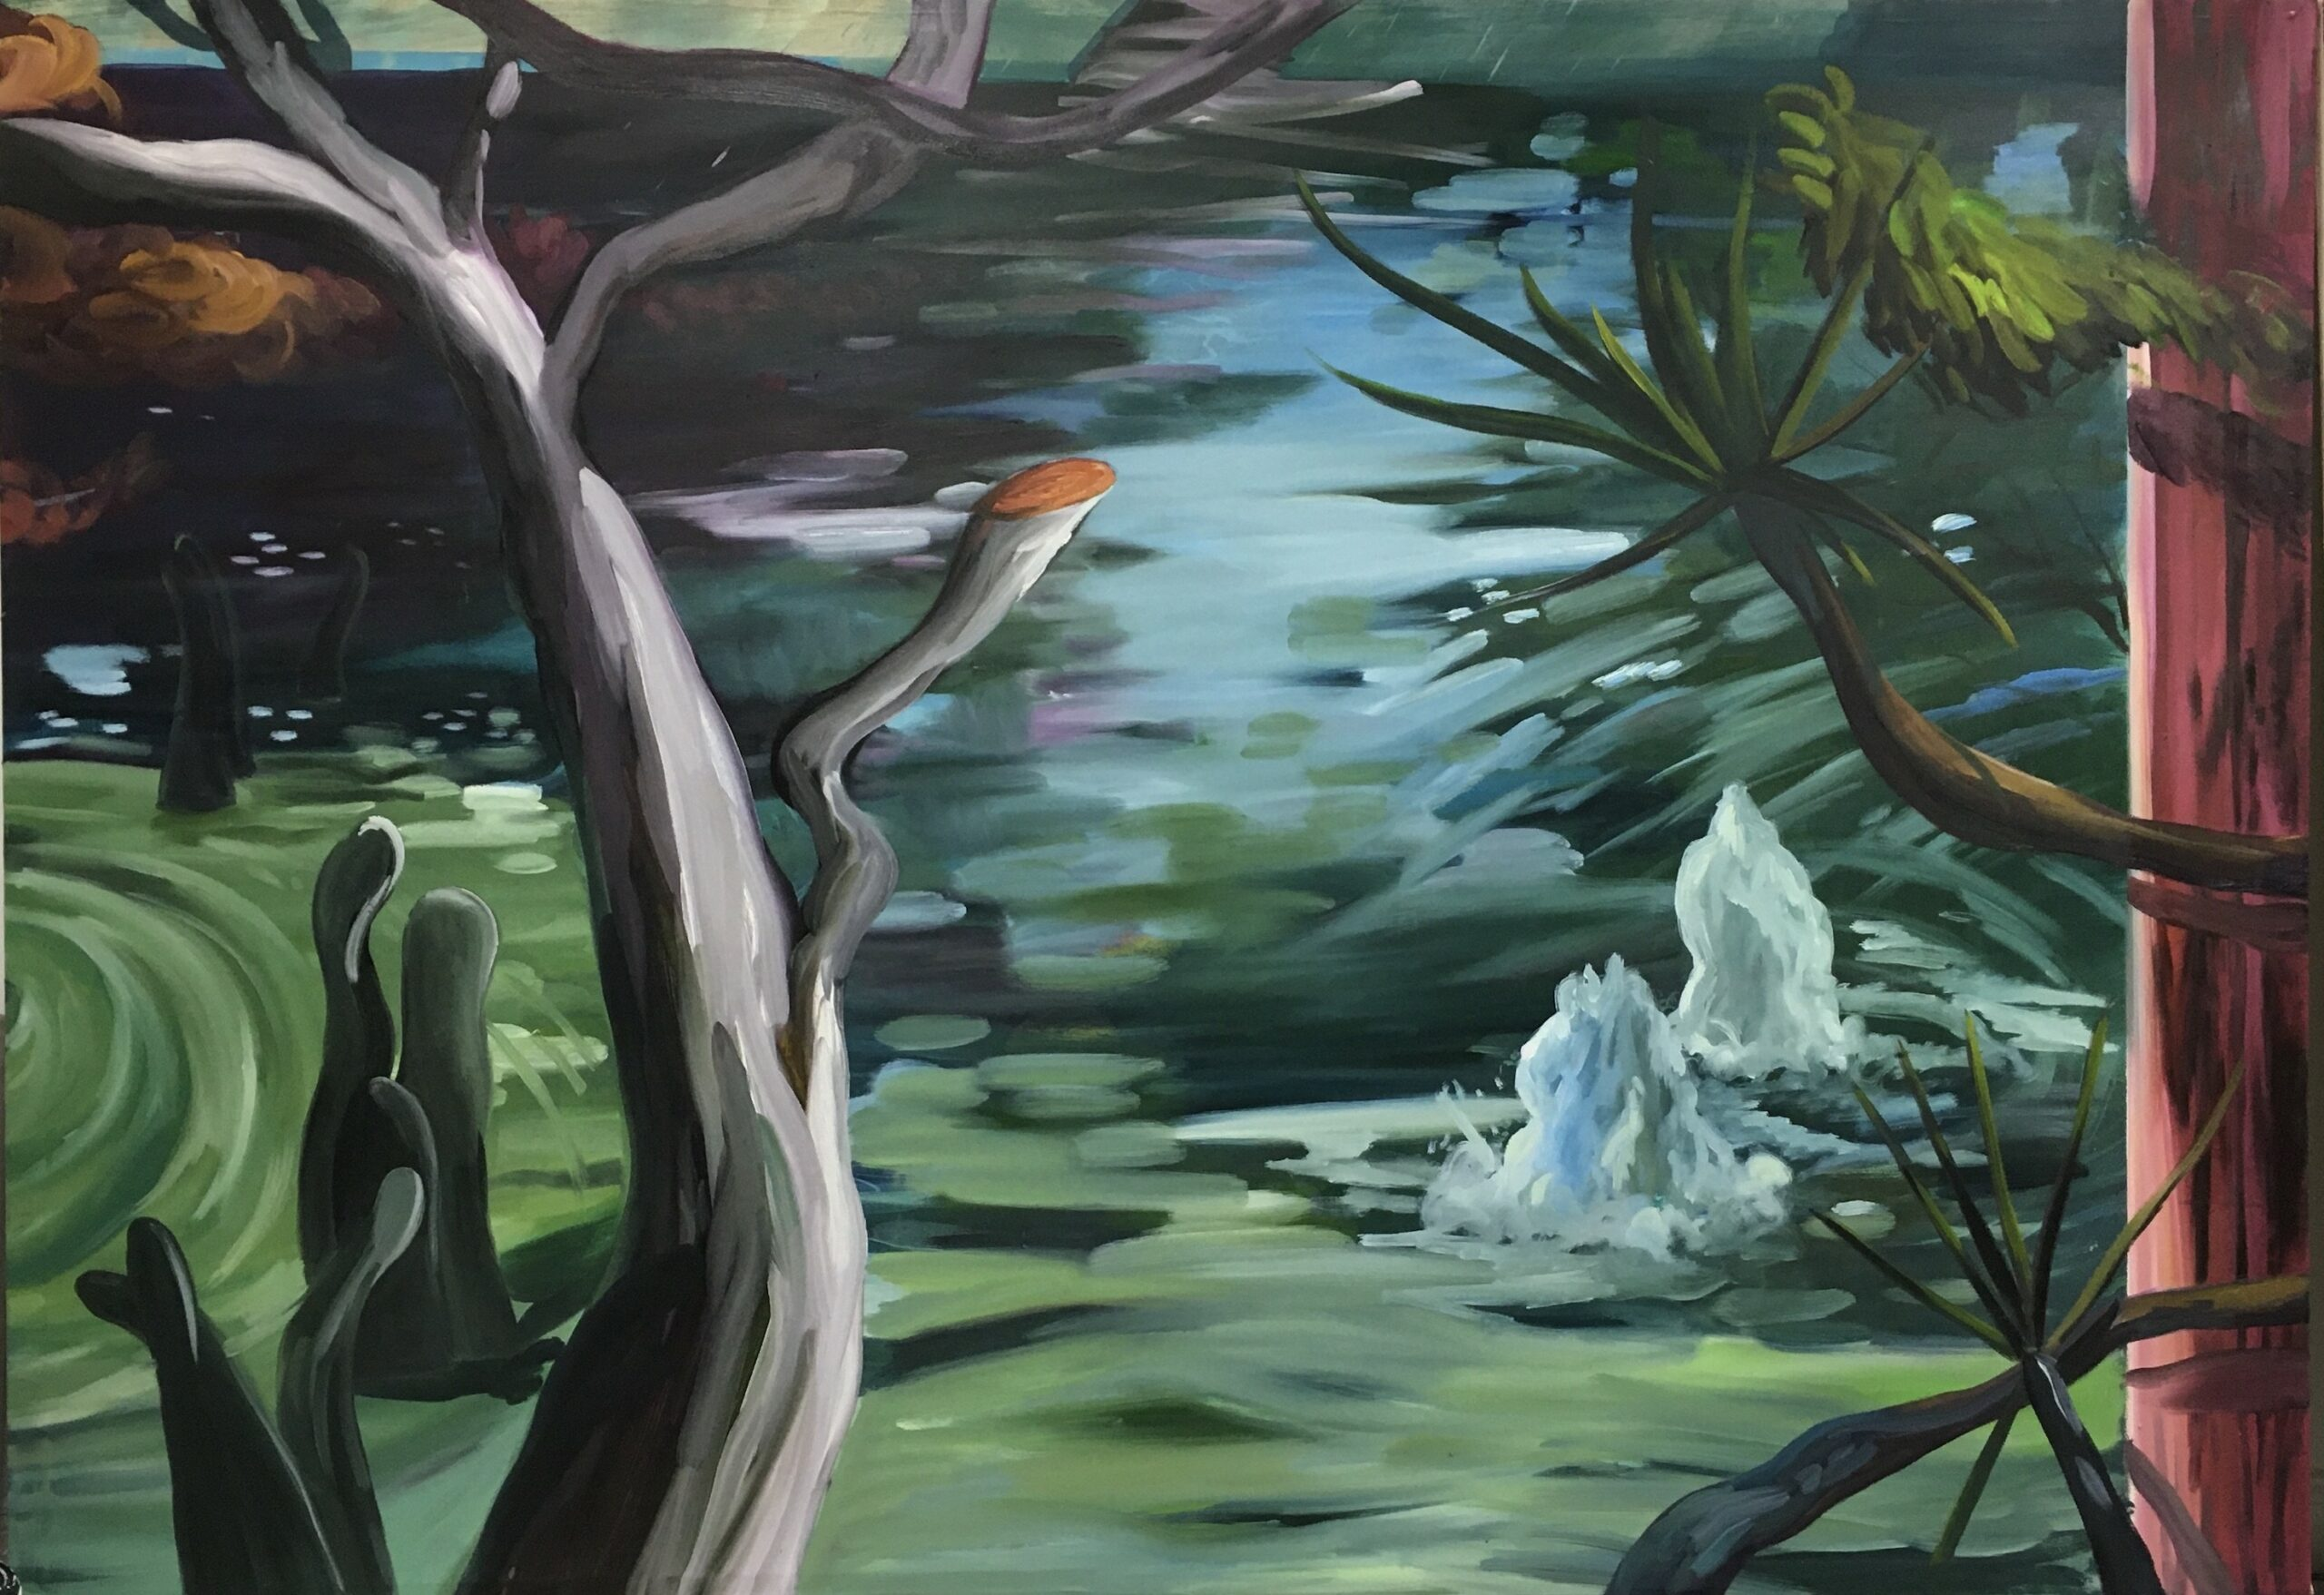 Ernesto Gutierrez Moya, The Pond (panel 4 of 6), 2020